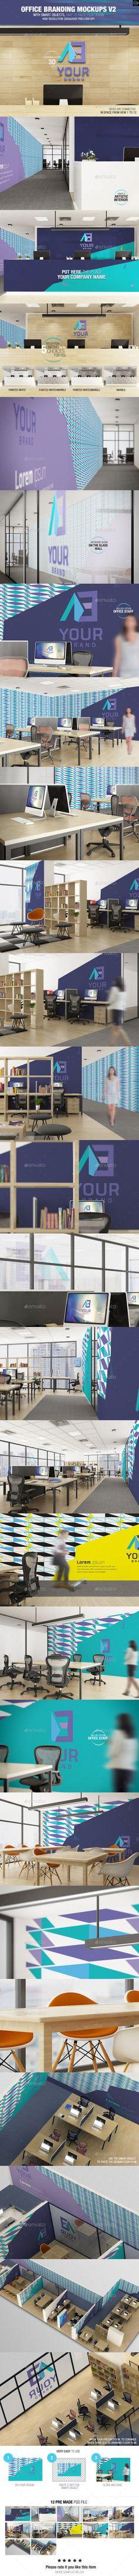 Office Branding Mockup V2 Office Interior Branding